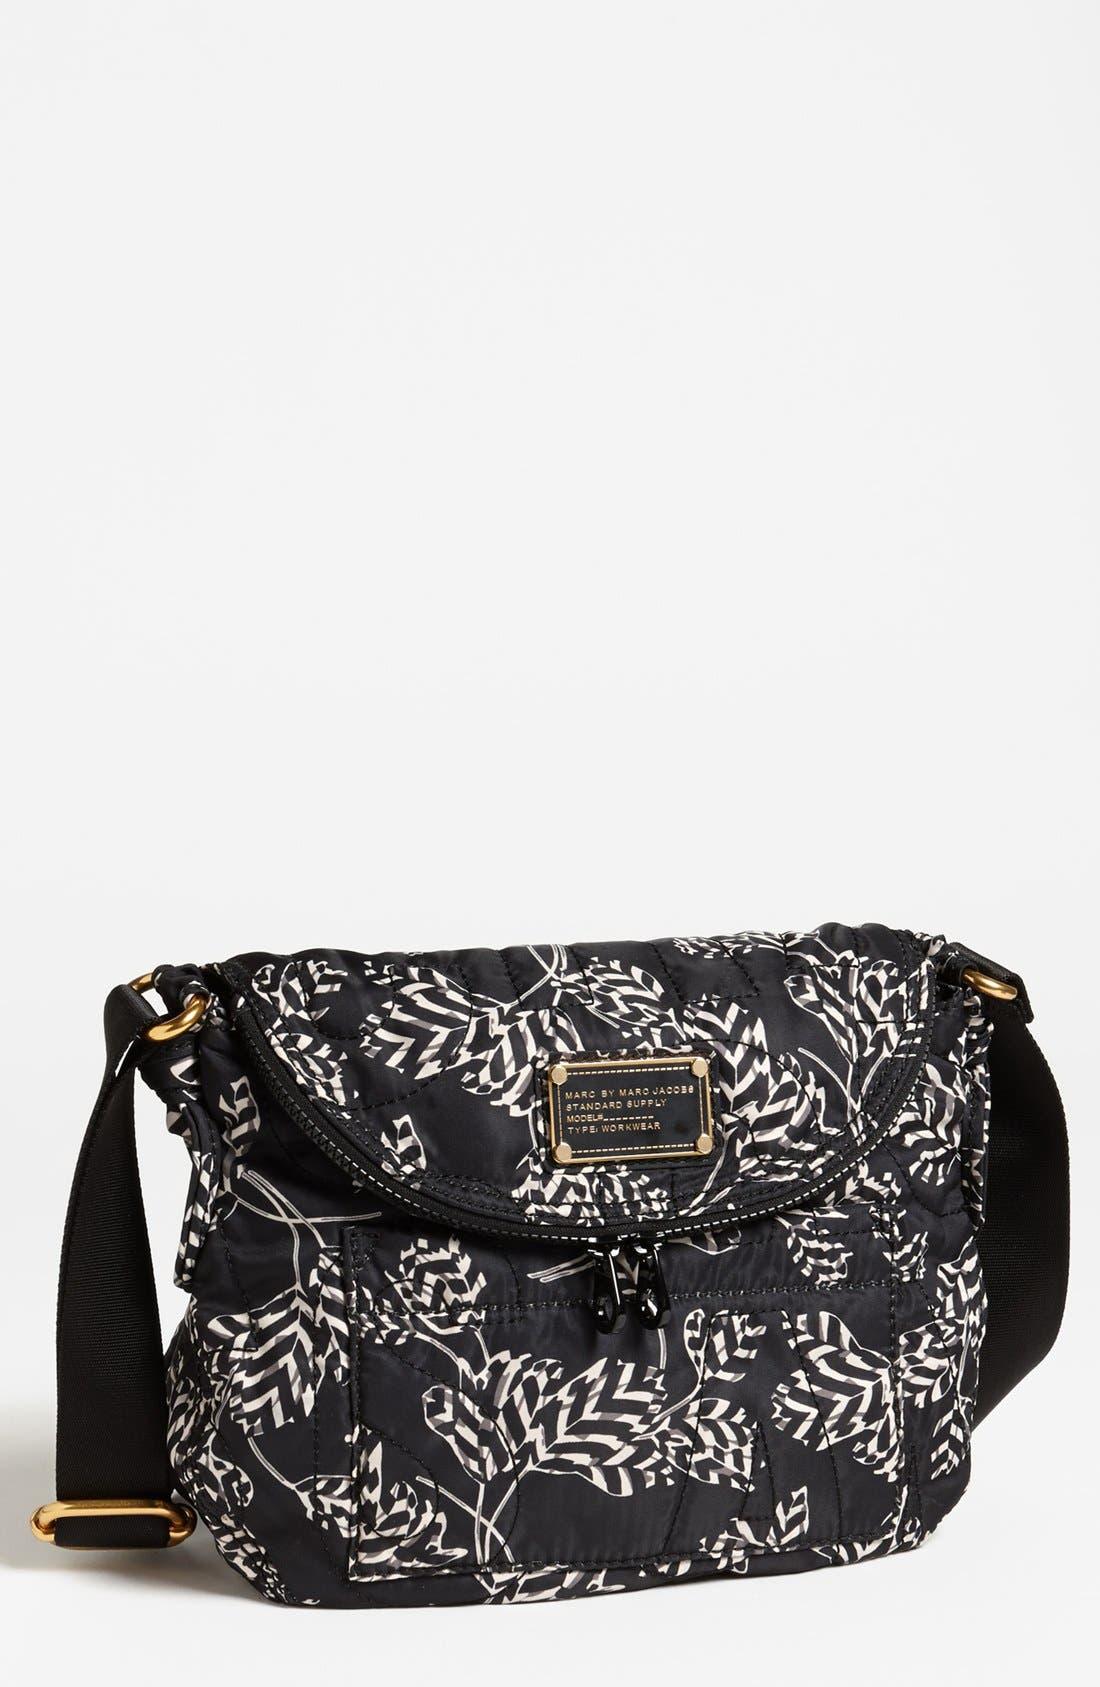 Alternate Image 1 Selected - MARC BY MARC JACOBS 'Pretty Nylon Natasha - Mini Mareika' Crossbody Bag